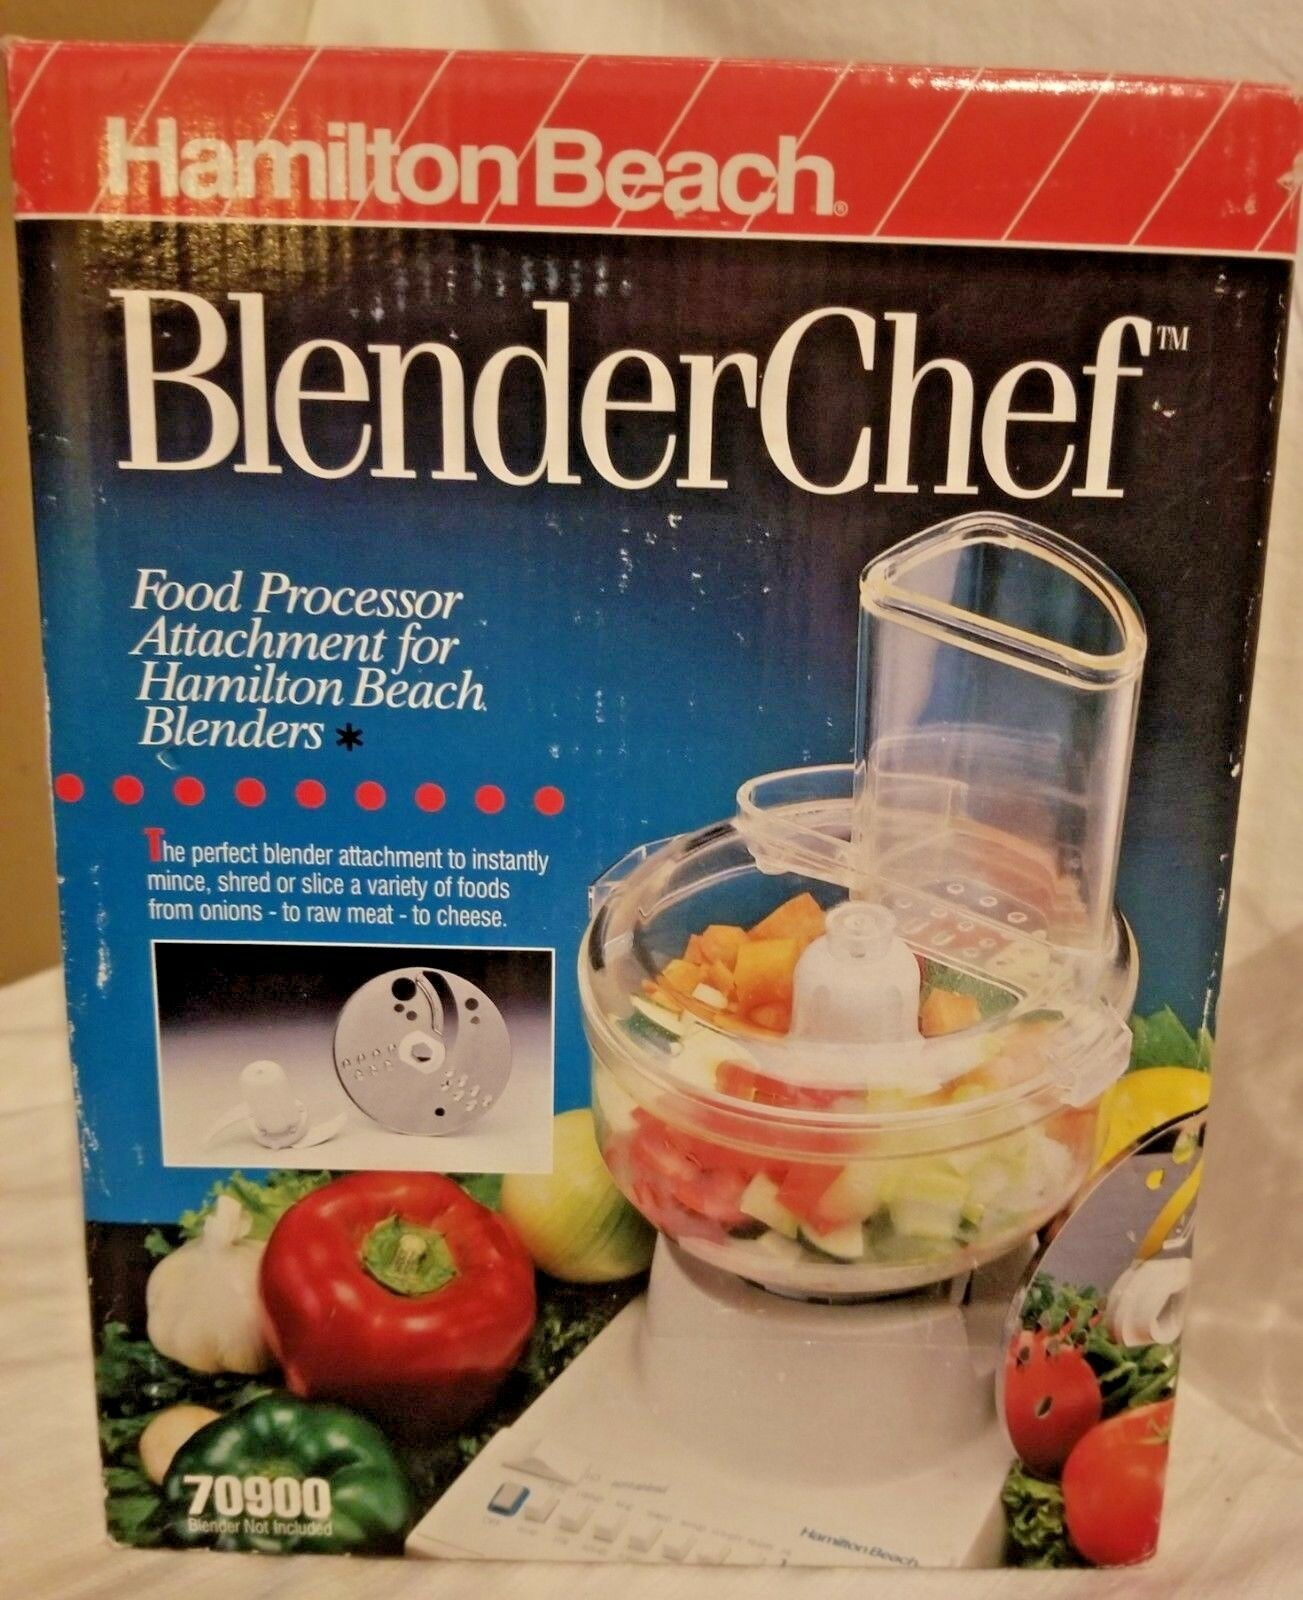 Hamilton Beach  blender Chef Food Processor Chopper Mixer Attachment 70900 image 3